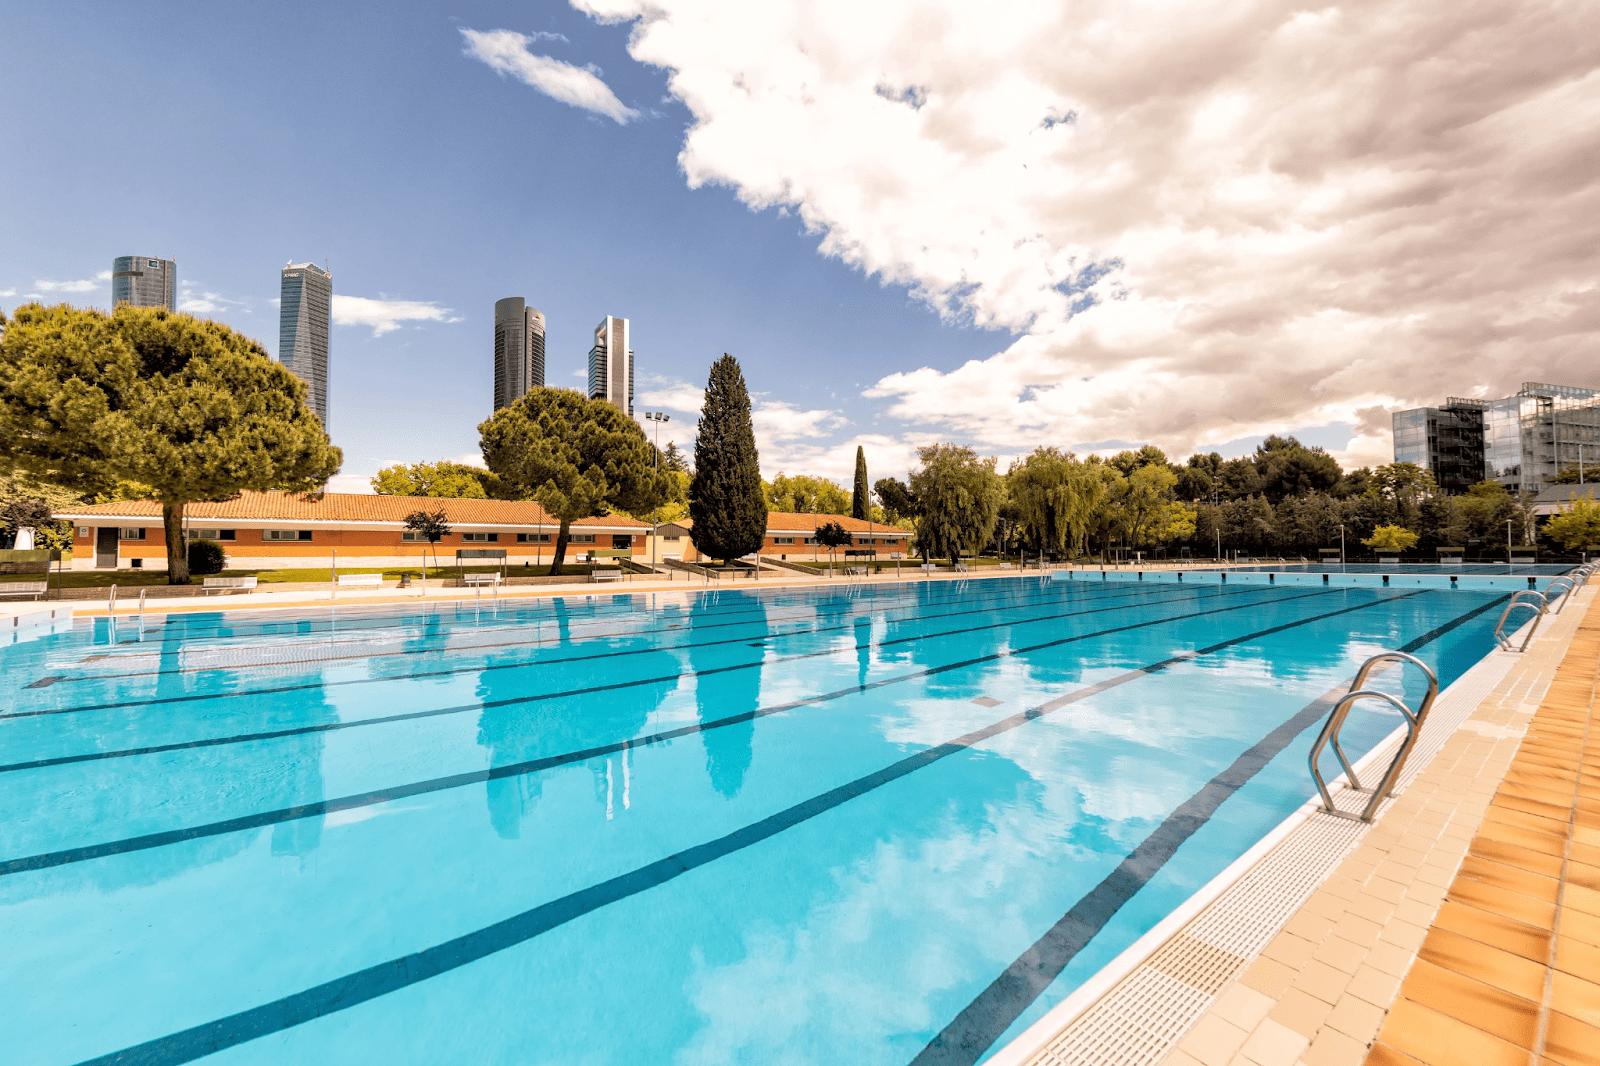 Public Pool Best Summer Plans in Madrid